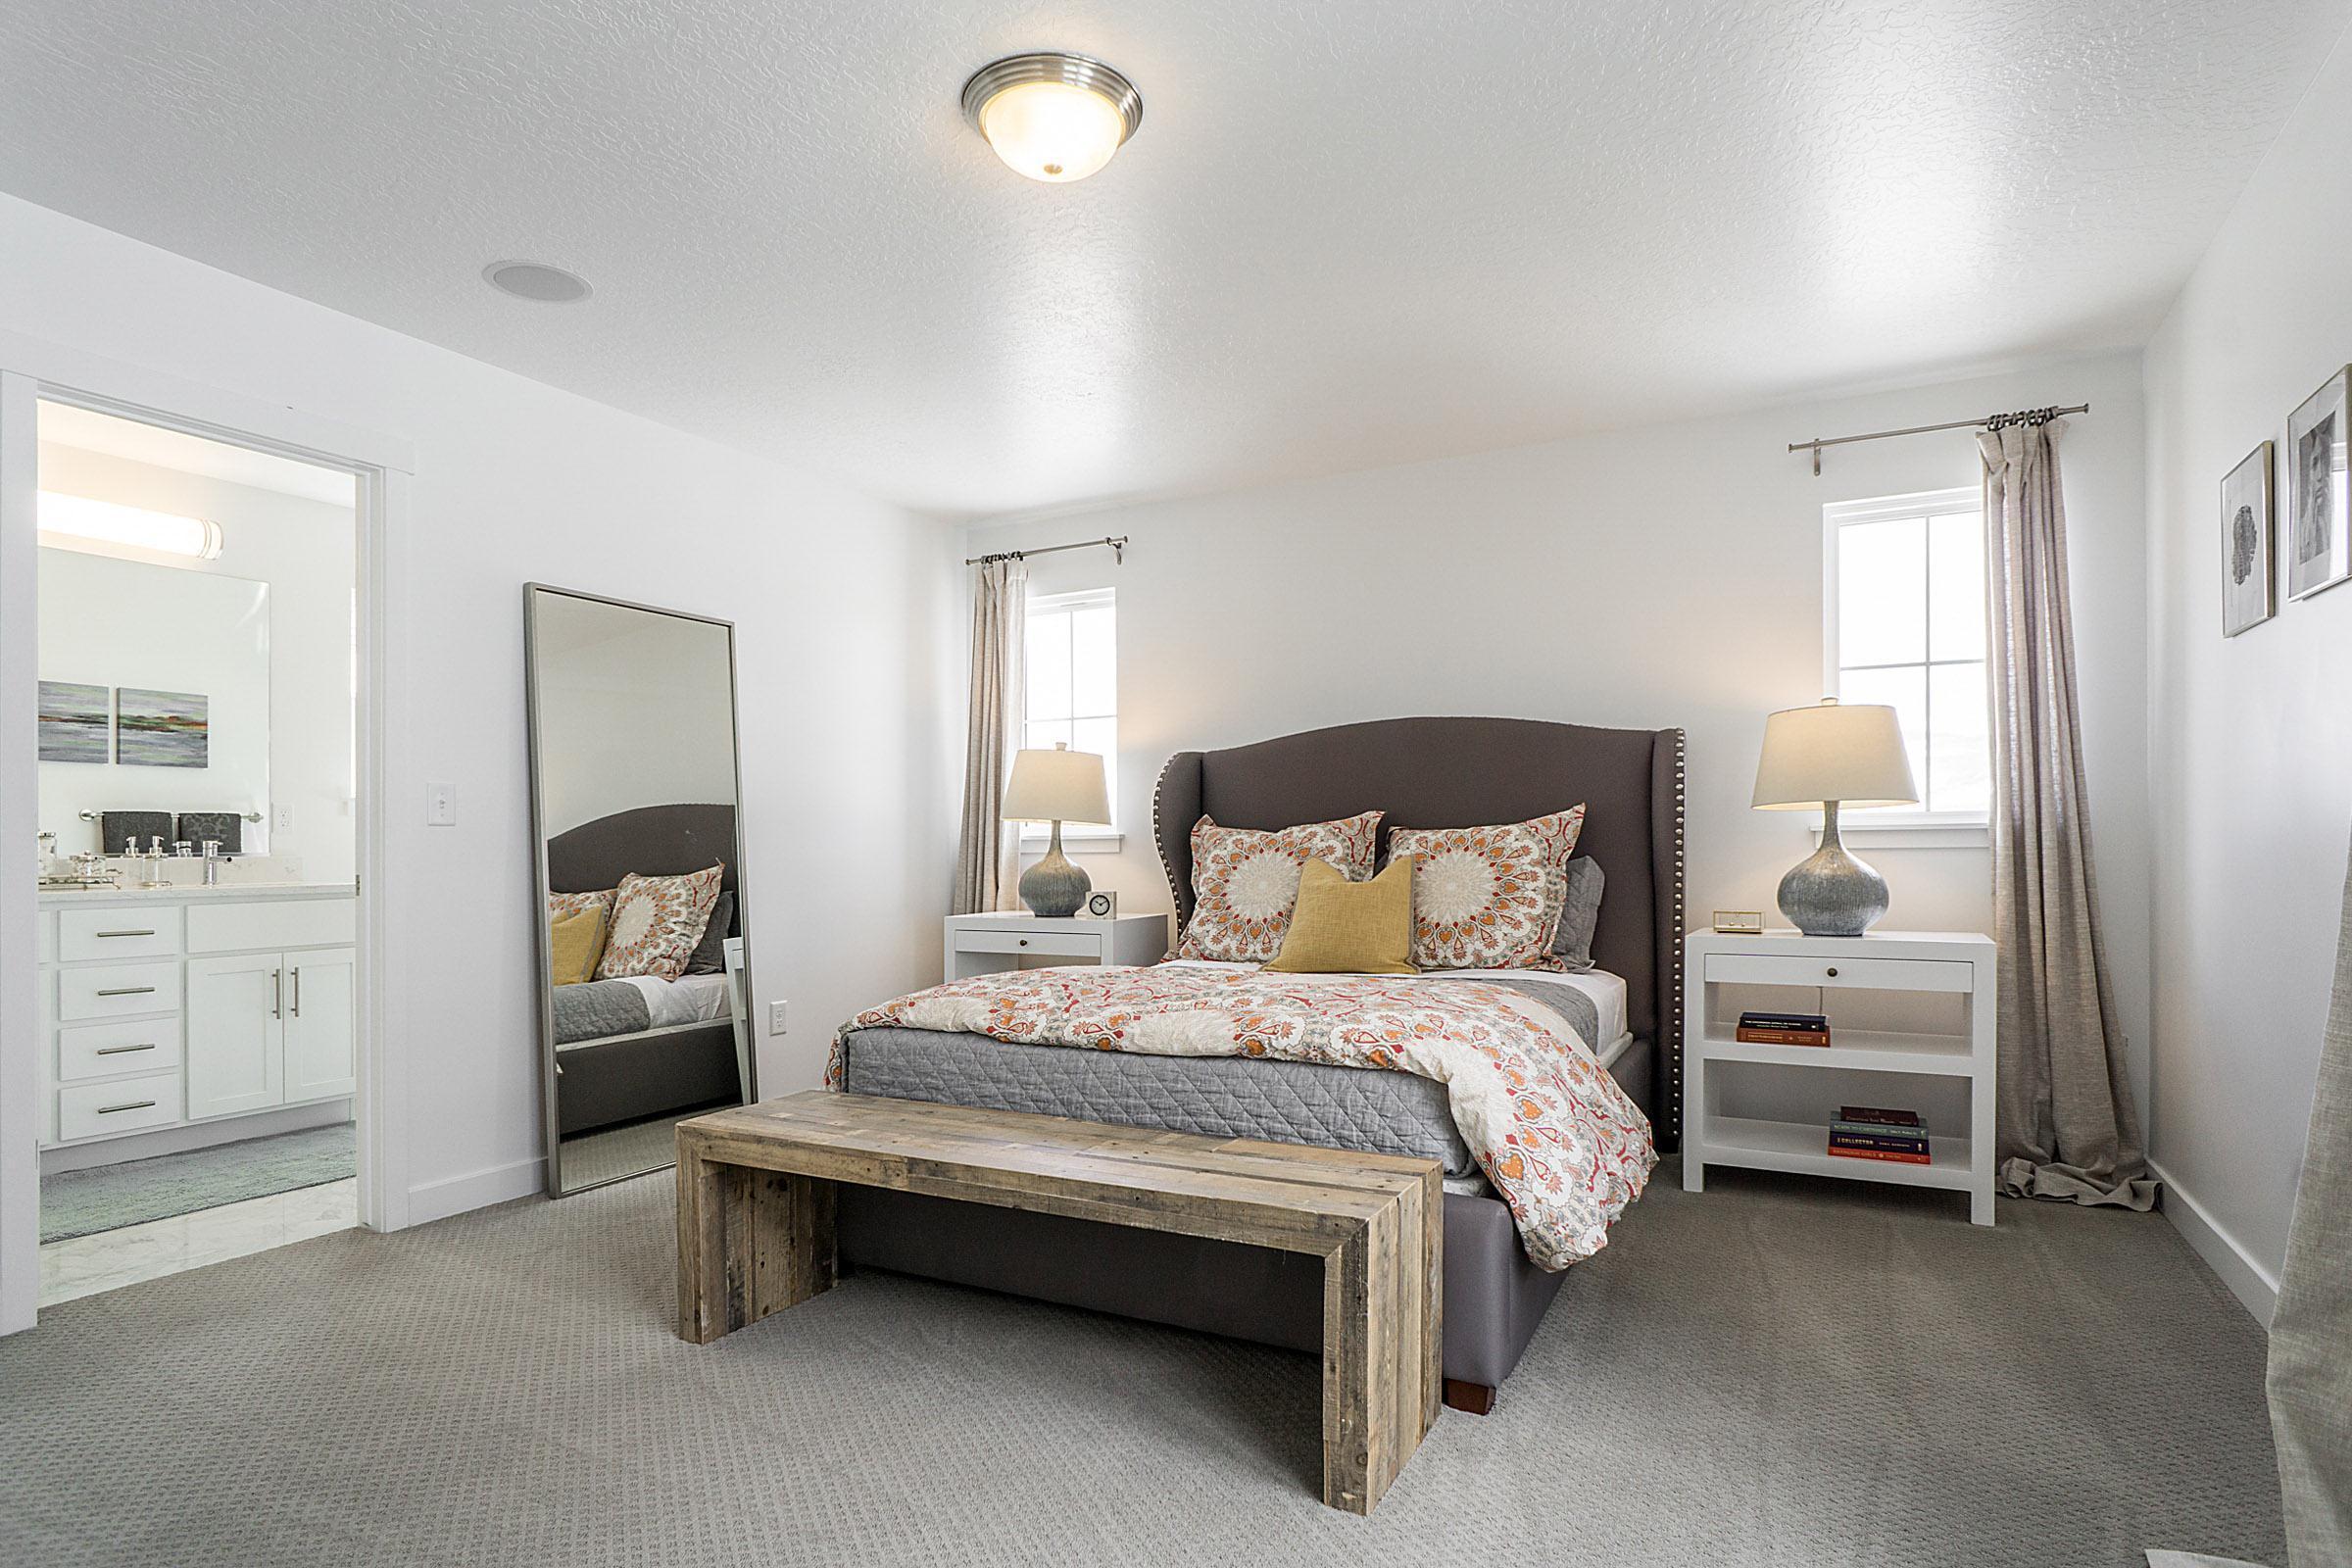 Bedroom featured in the Cezanne By Garbett Homes in Salt Lake City-Ogden, UT